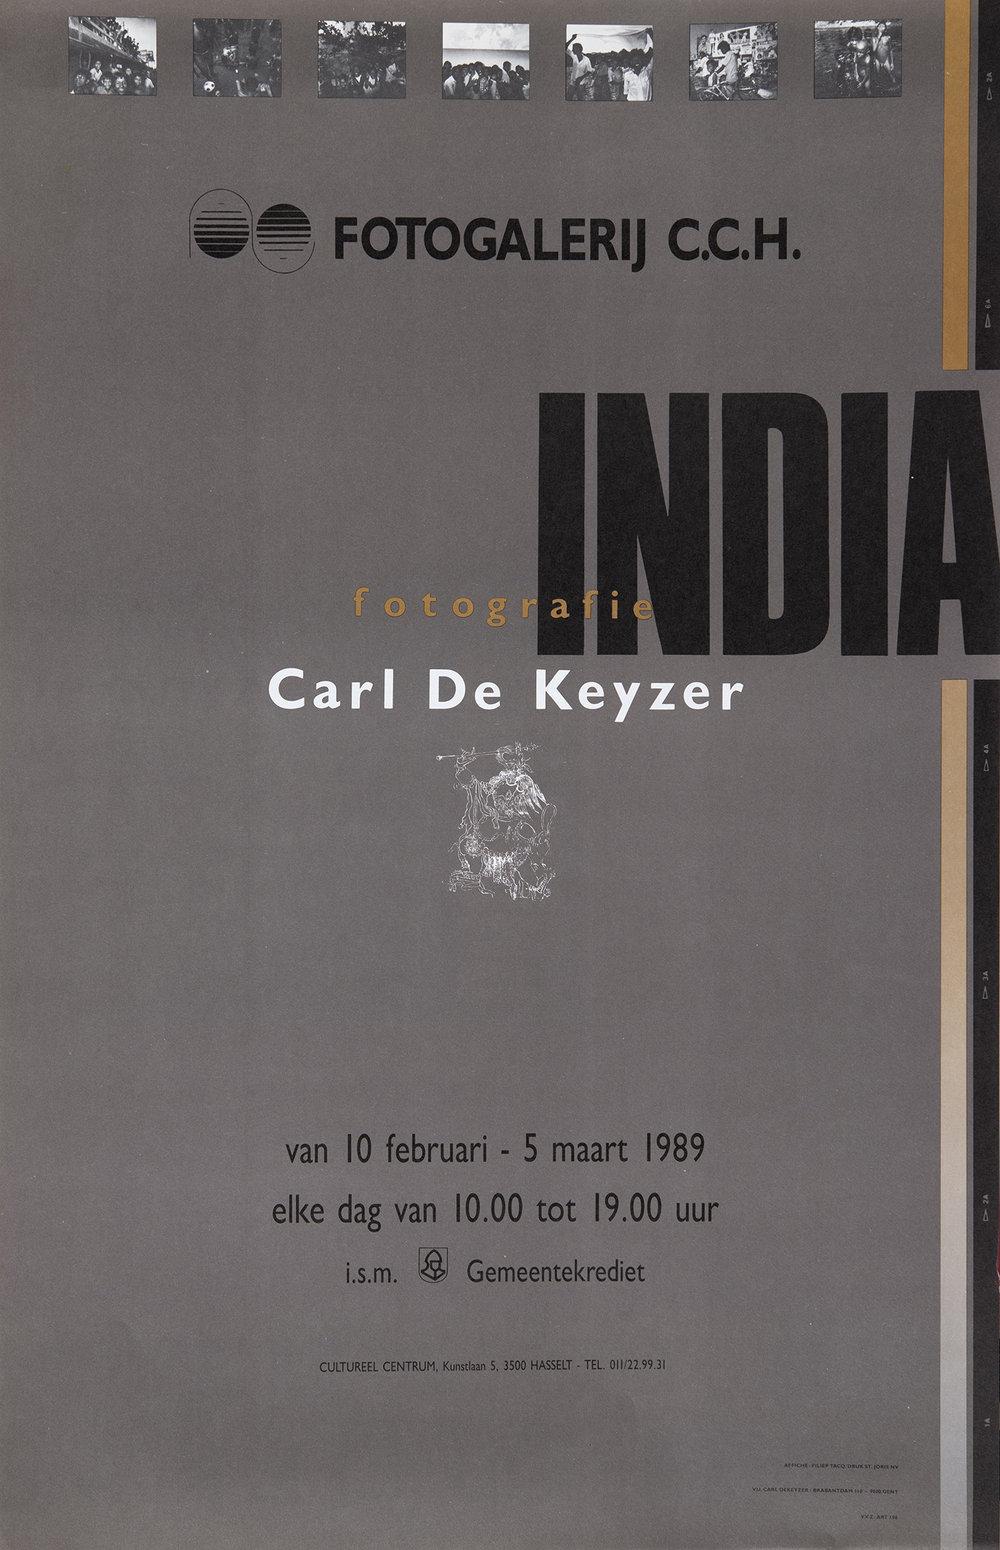 1989 India CCH.jpg